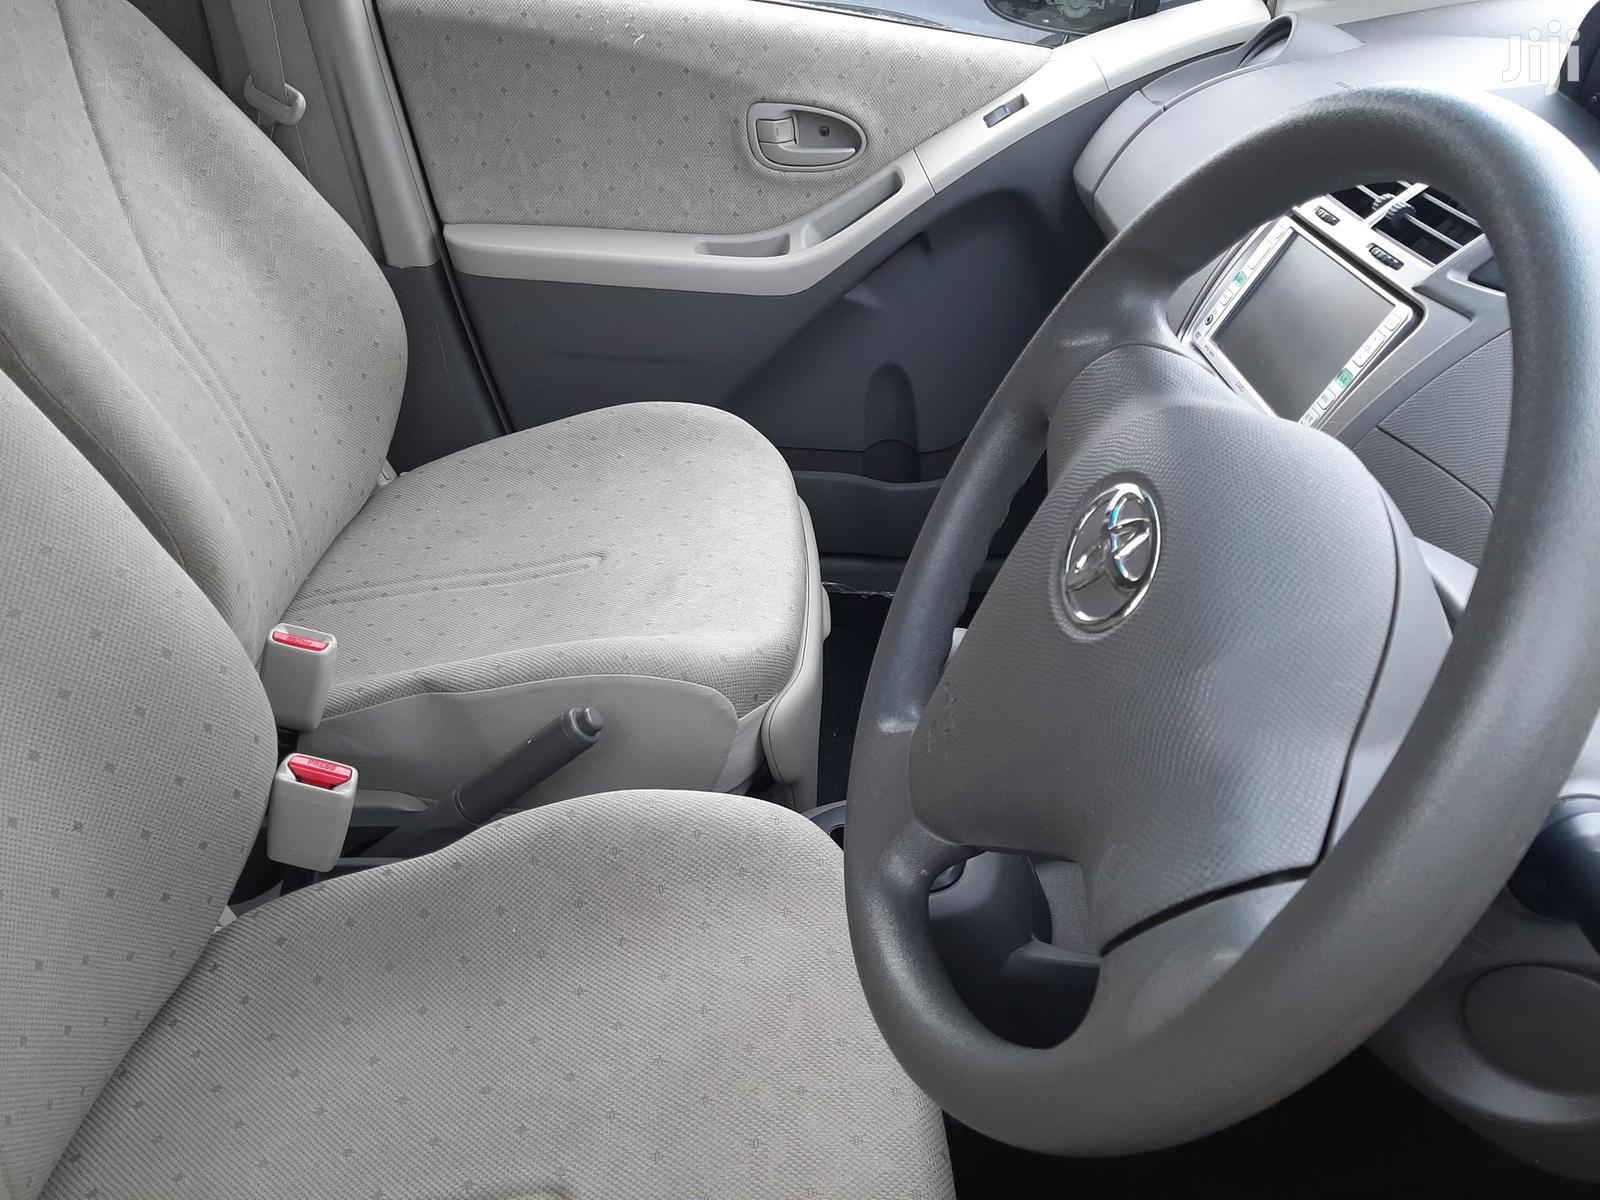 Archive: Toyota Vitz 2007 Silver